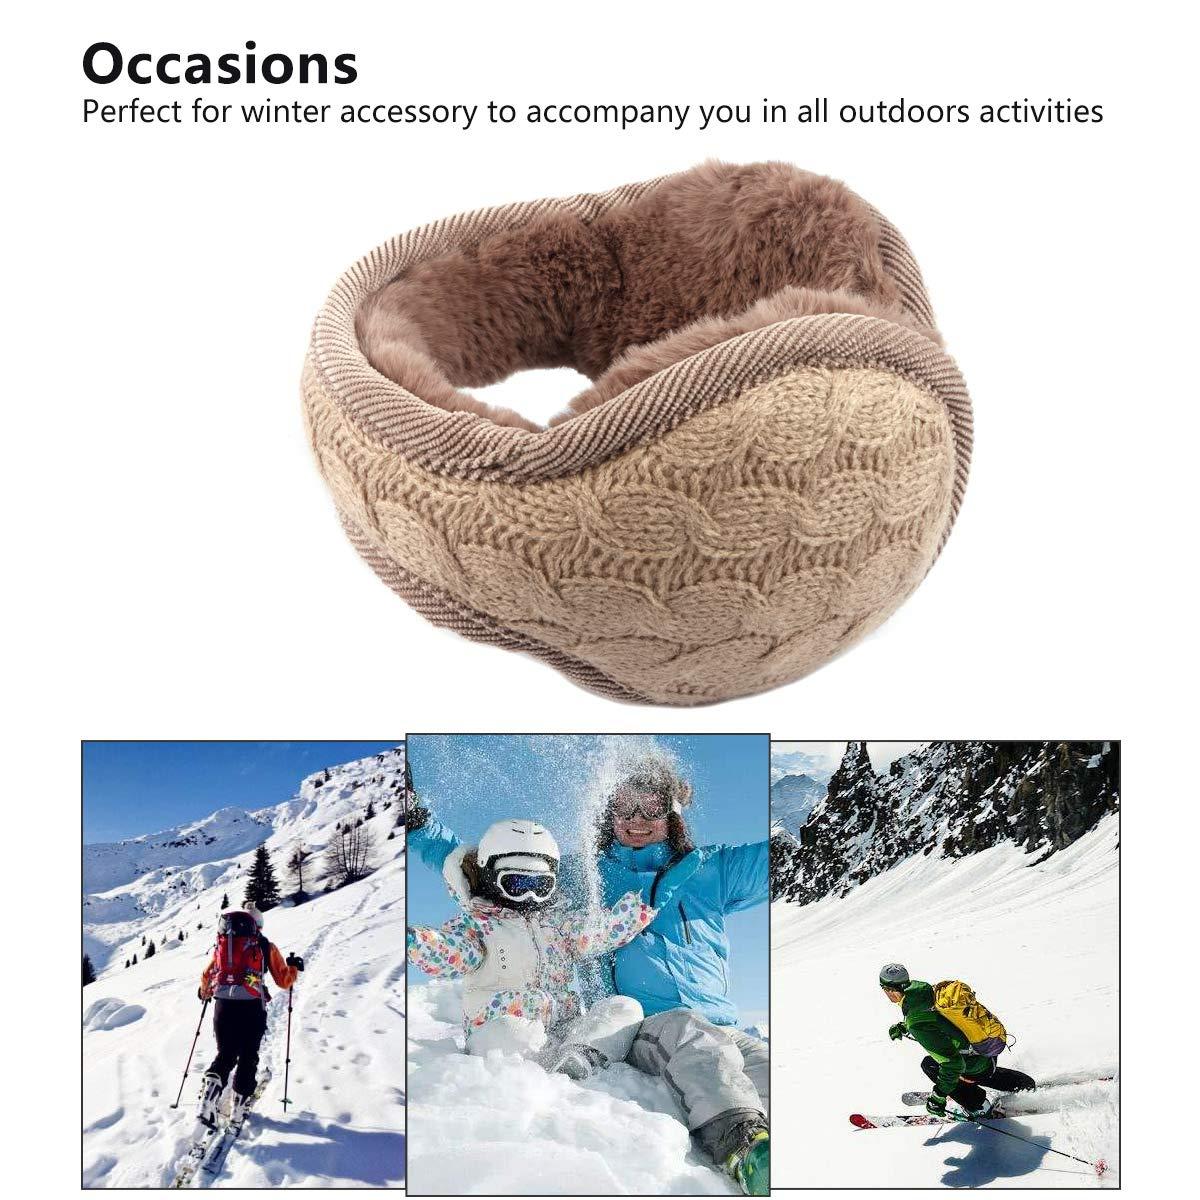 Metog Unisex Foldable Ear Warmers Polar kints Winter EarMuffs (khaki, One size) by Metog (Image #7)